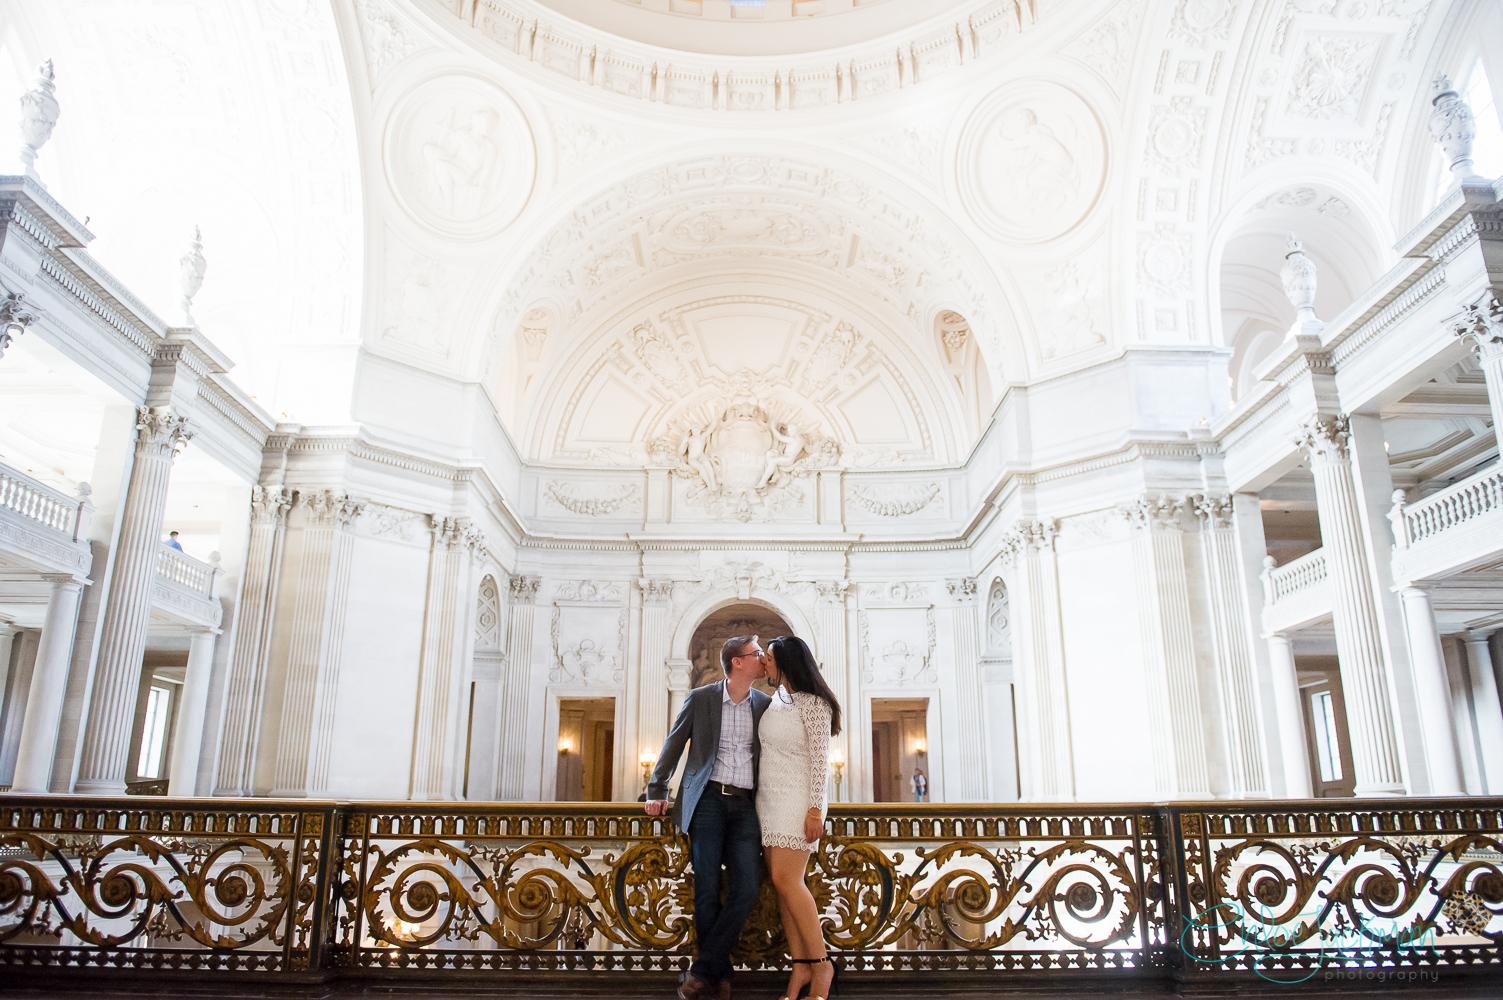 Chloe-Jackman-Photography-City-Hall-Wedding-2014-127